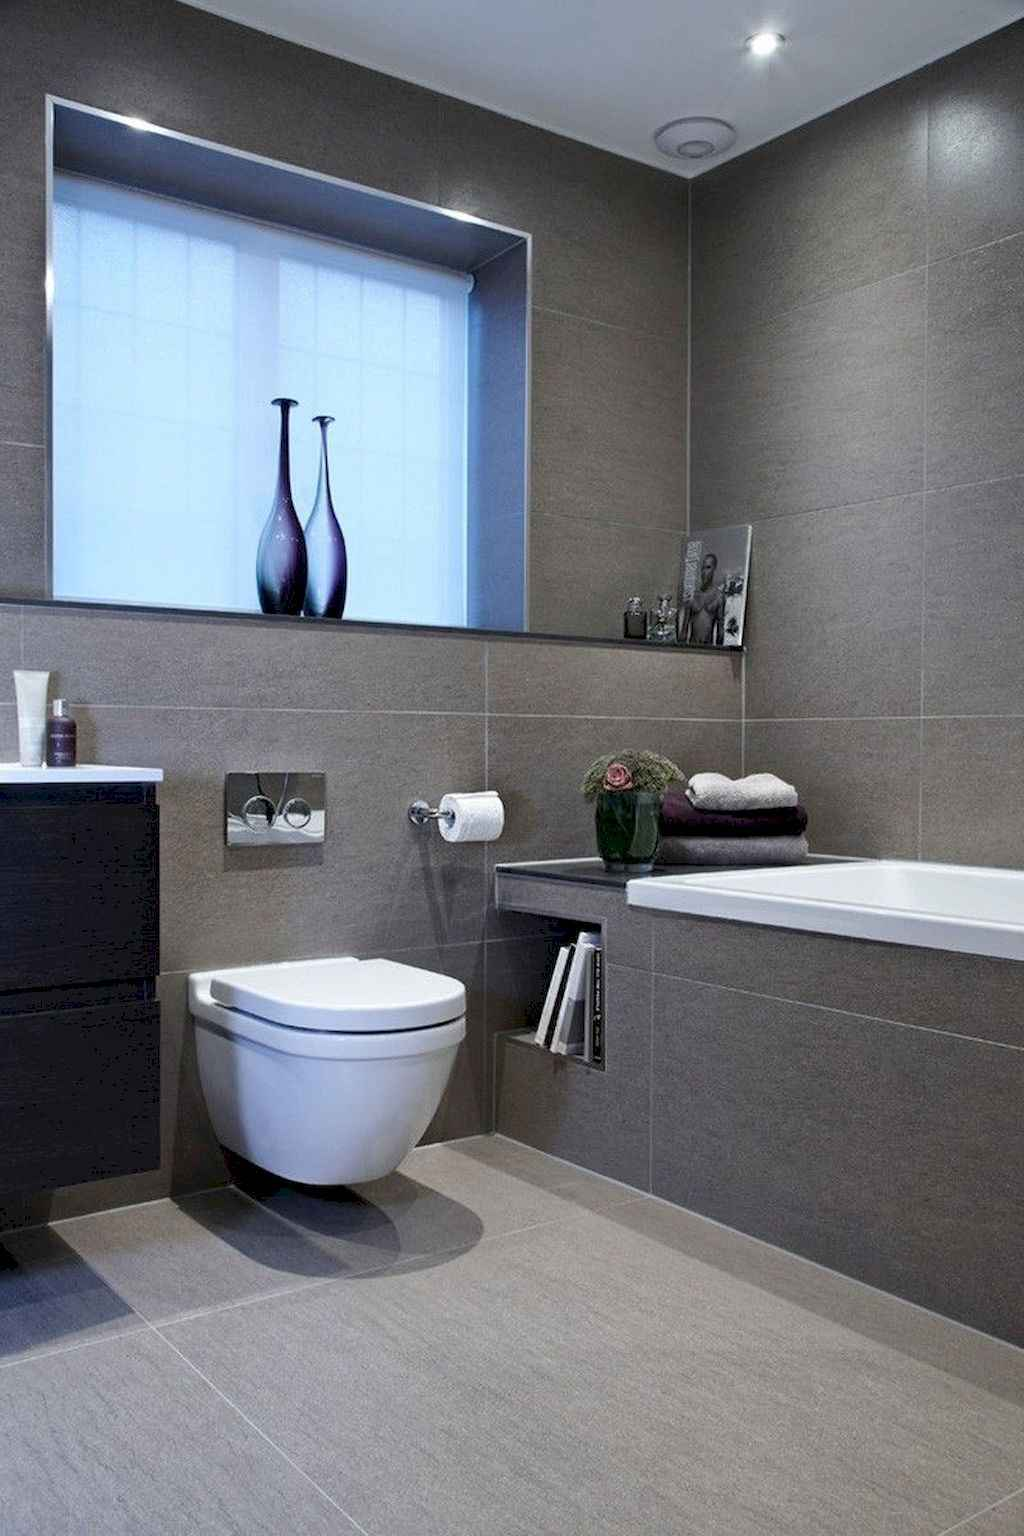 111 Brilliant Small Bathroom Remodel Ideas On A Budget (73)